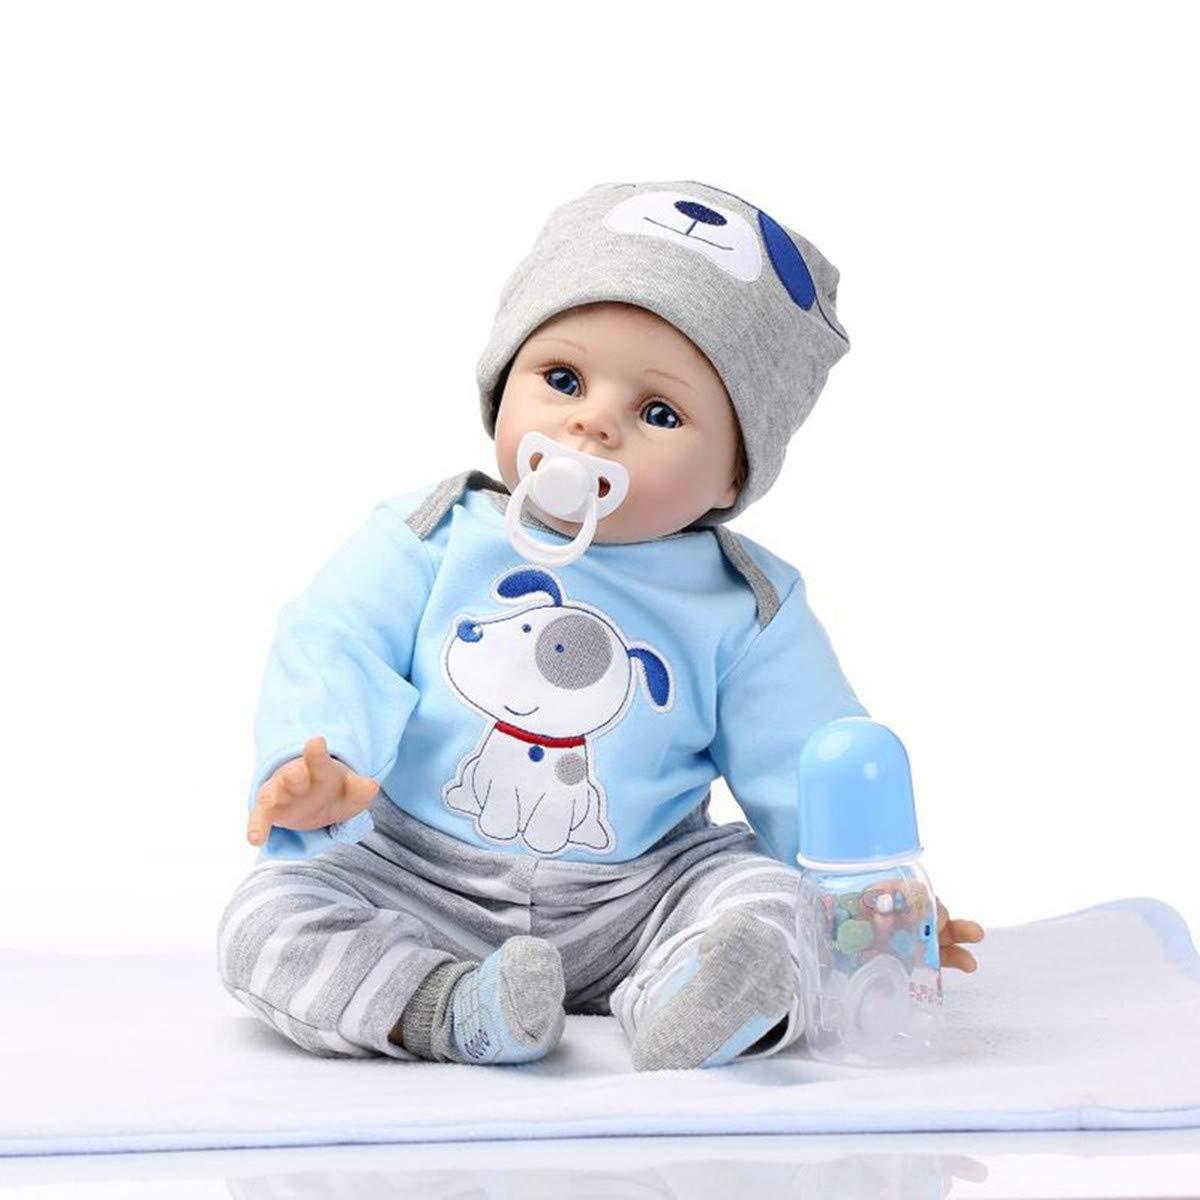 ZIYIUI Lifelike 22 inch 55cm Reborn Baby Doll Boy Handmade Soft Silicone Vinyl Magnetic Mouth Dummy and Doll Clothes Newborn Xmas Gift